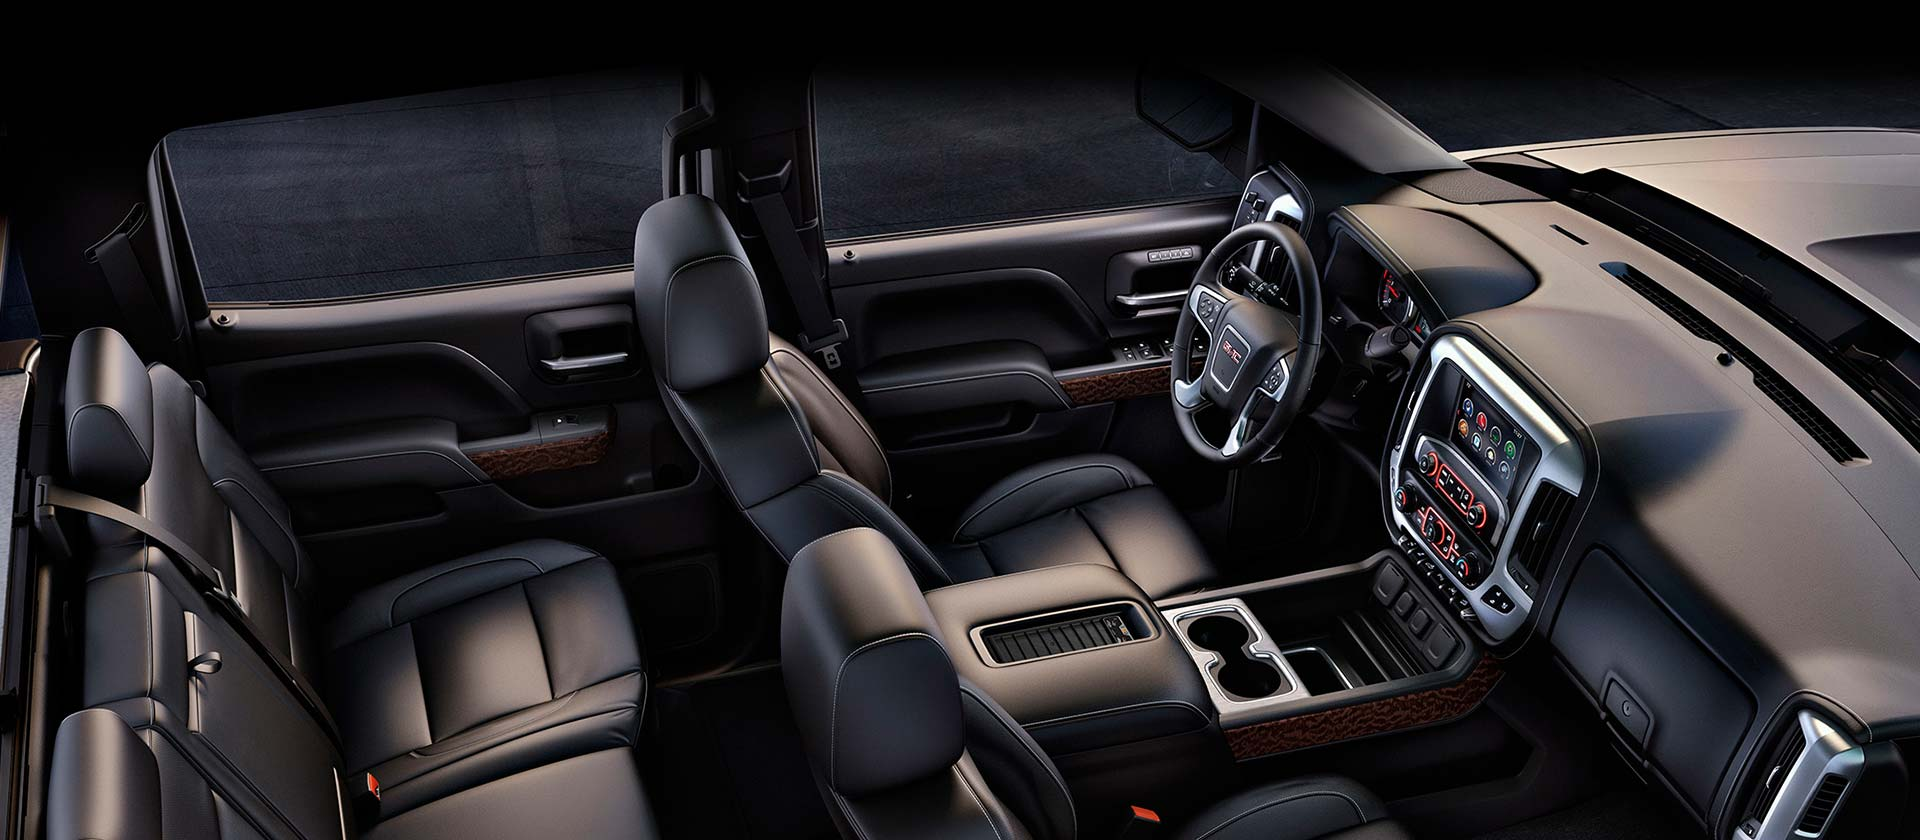 New GMC Sierra 1500 Interior image 2